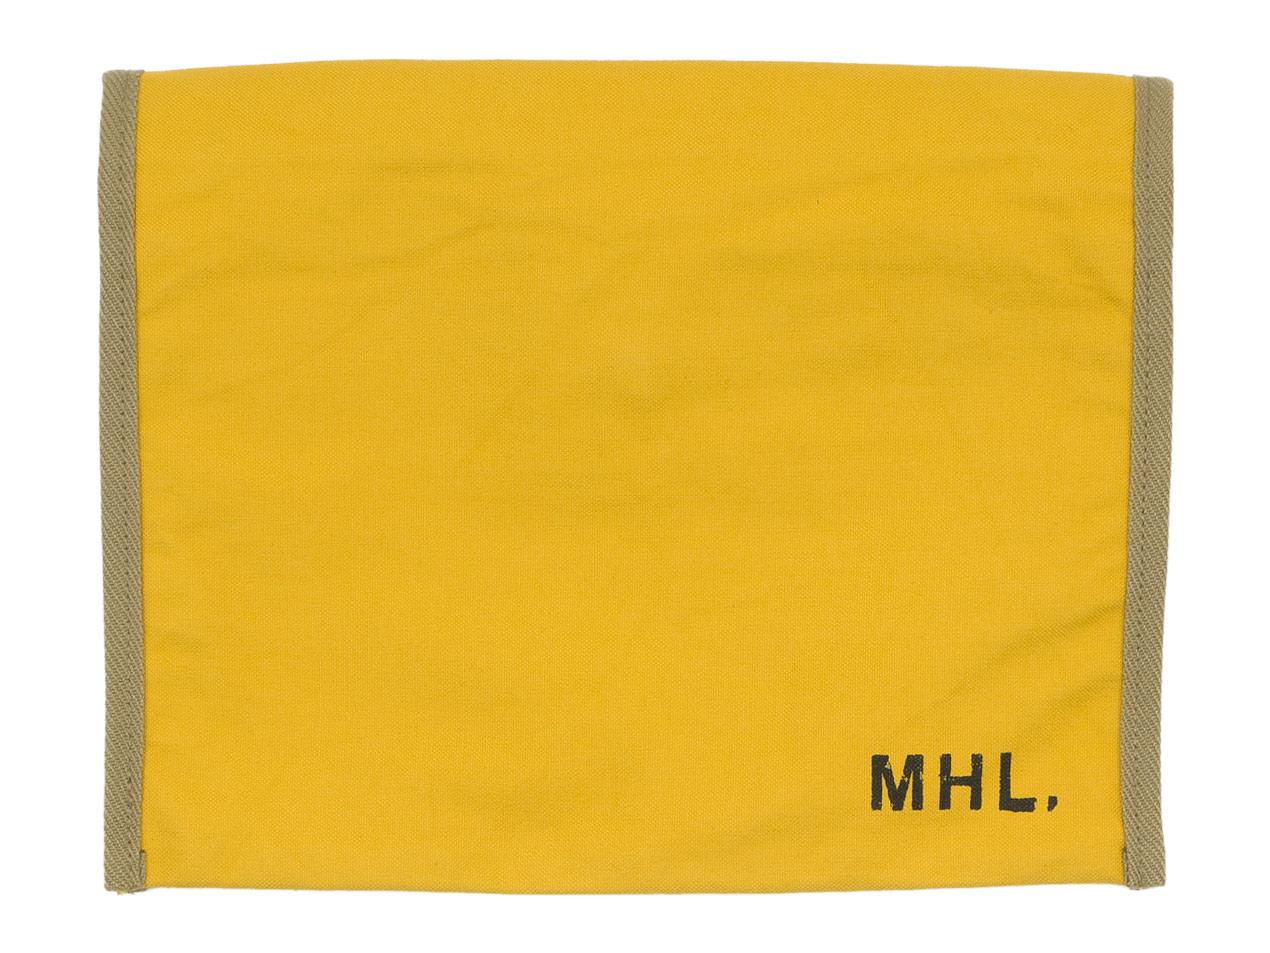 MHL. BASIC COTTON CANVAS POUCH LARGE